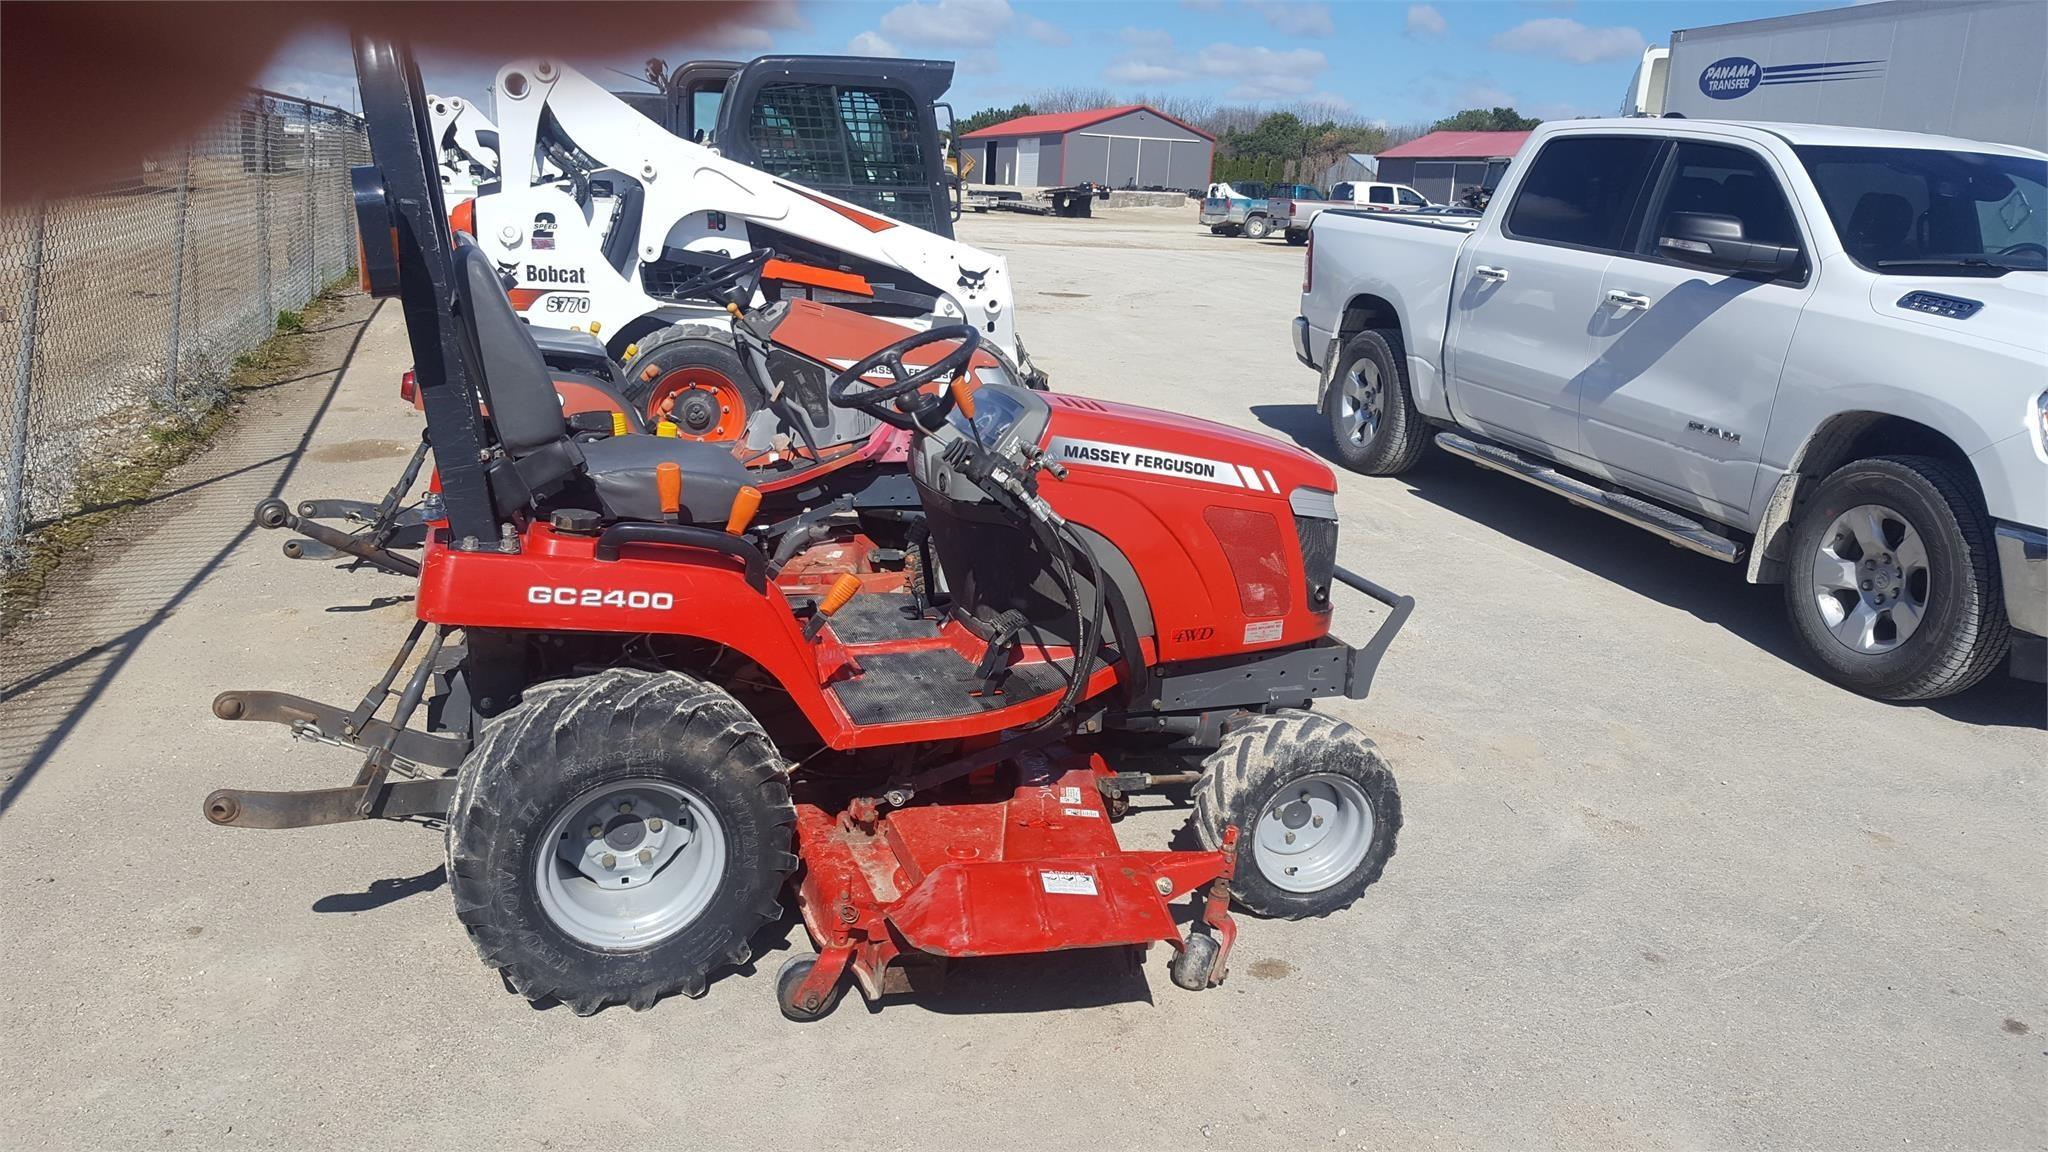 2009 Massey Ferguson GC2400 Tractor